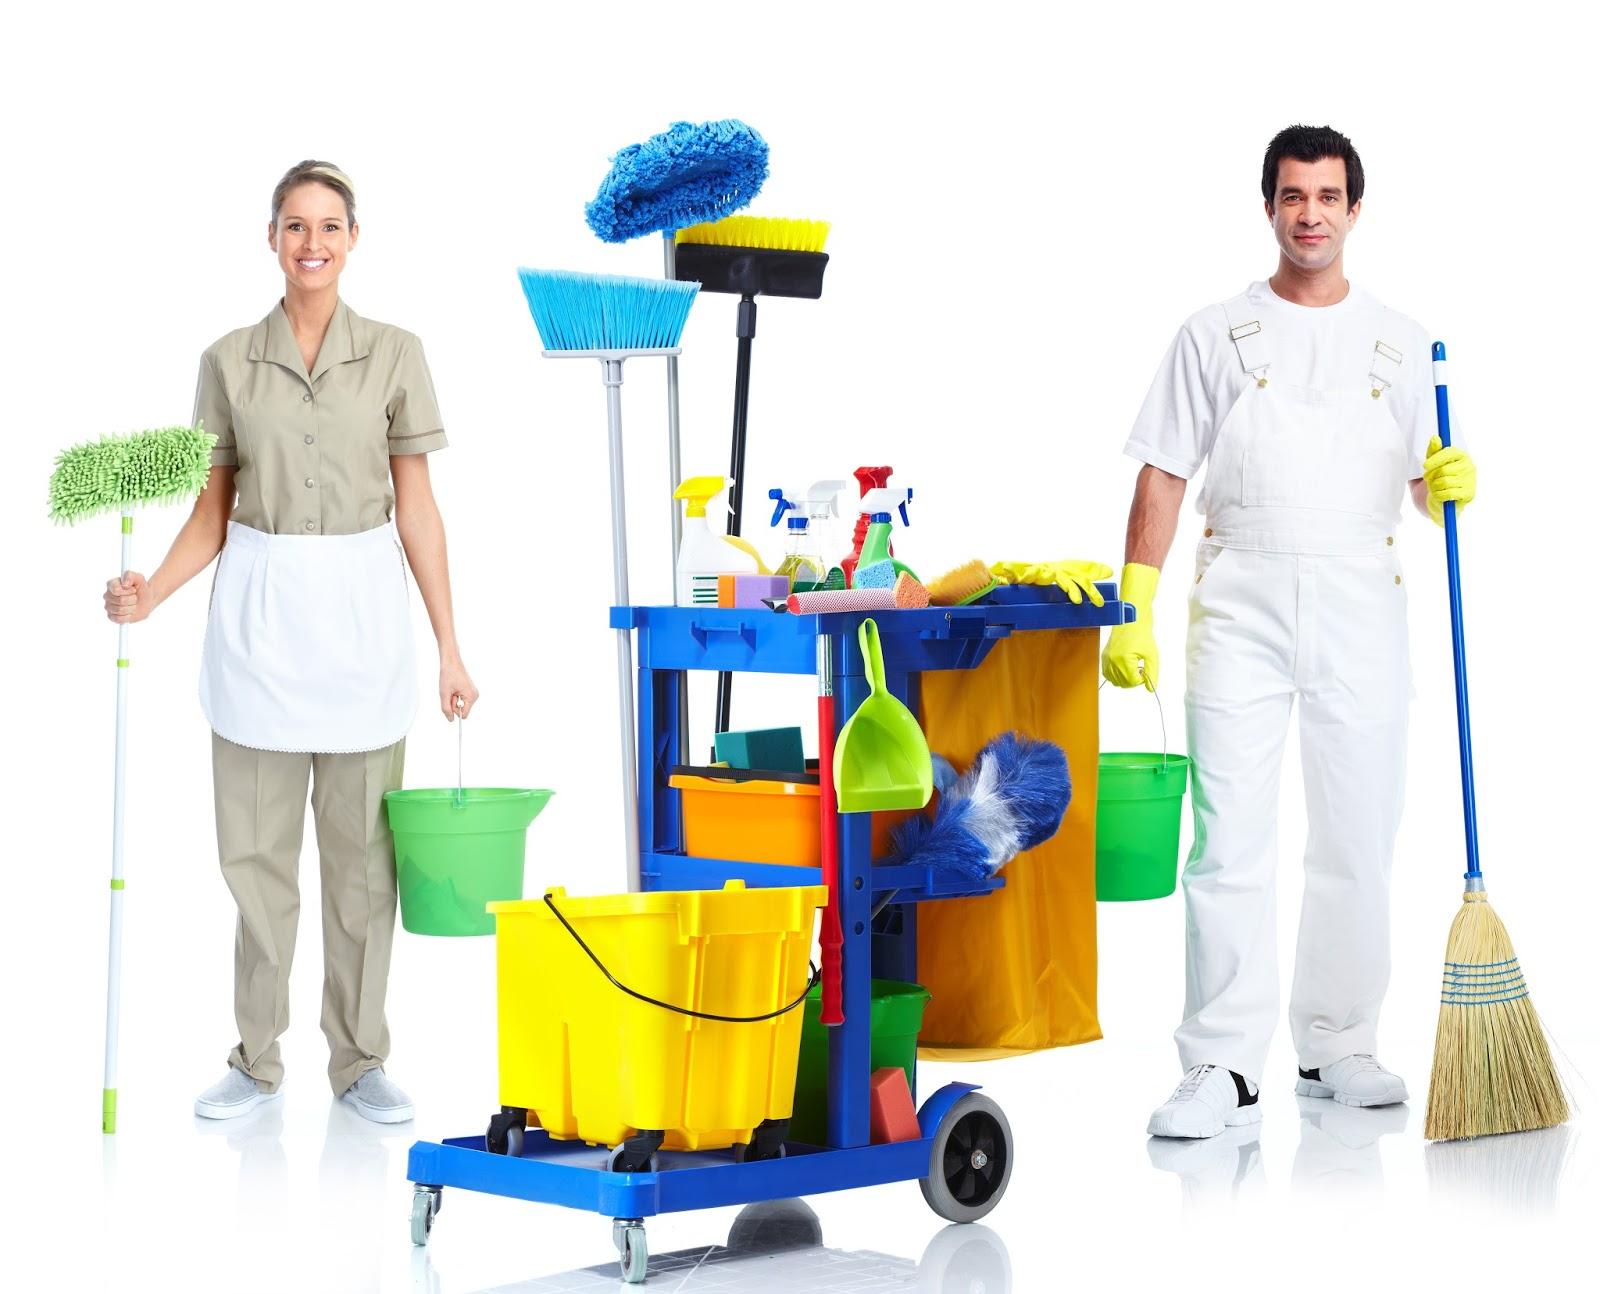 Nettoyage: propreté et hygiène ~ EEMS Al-Hoceima